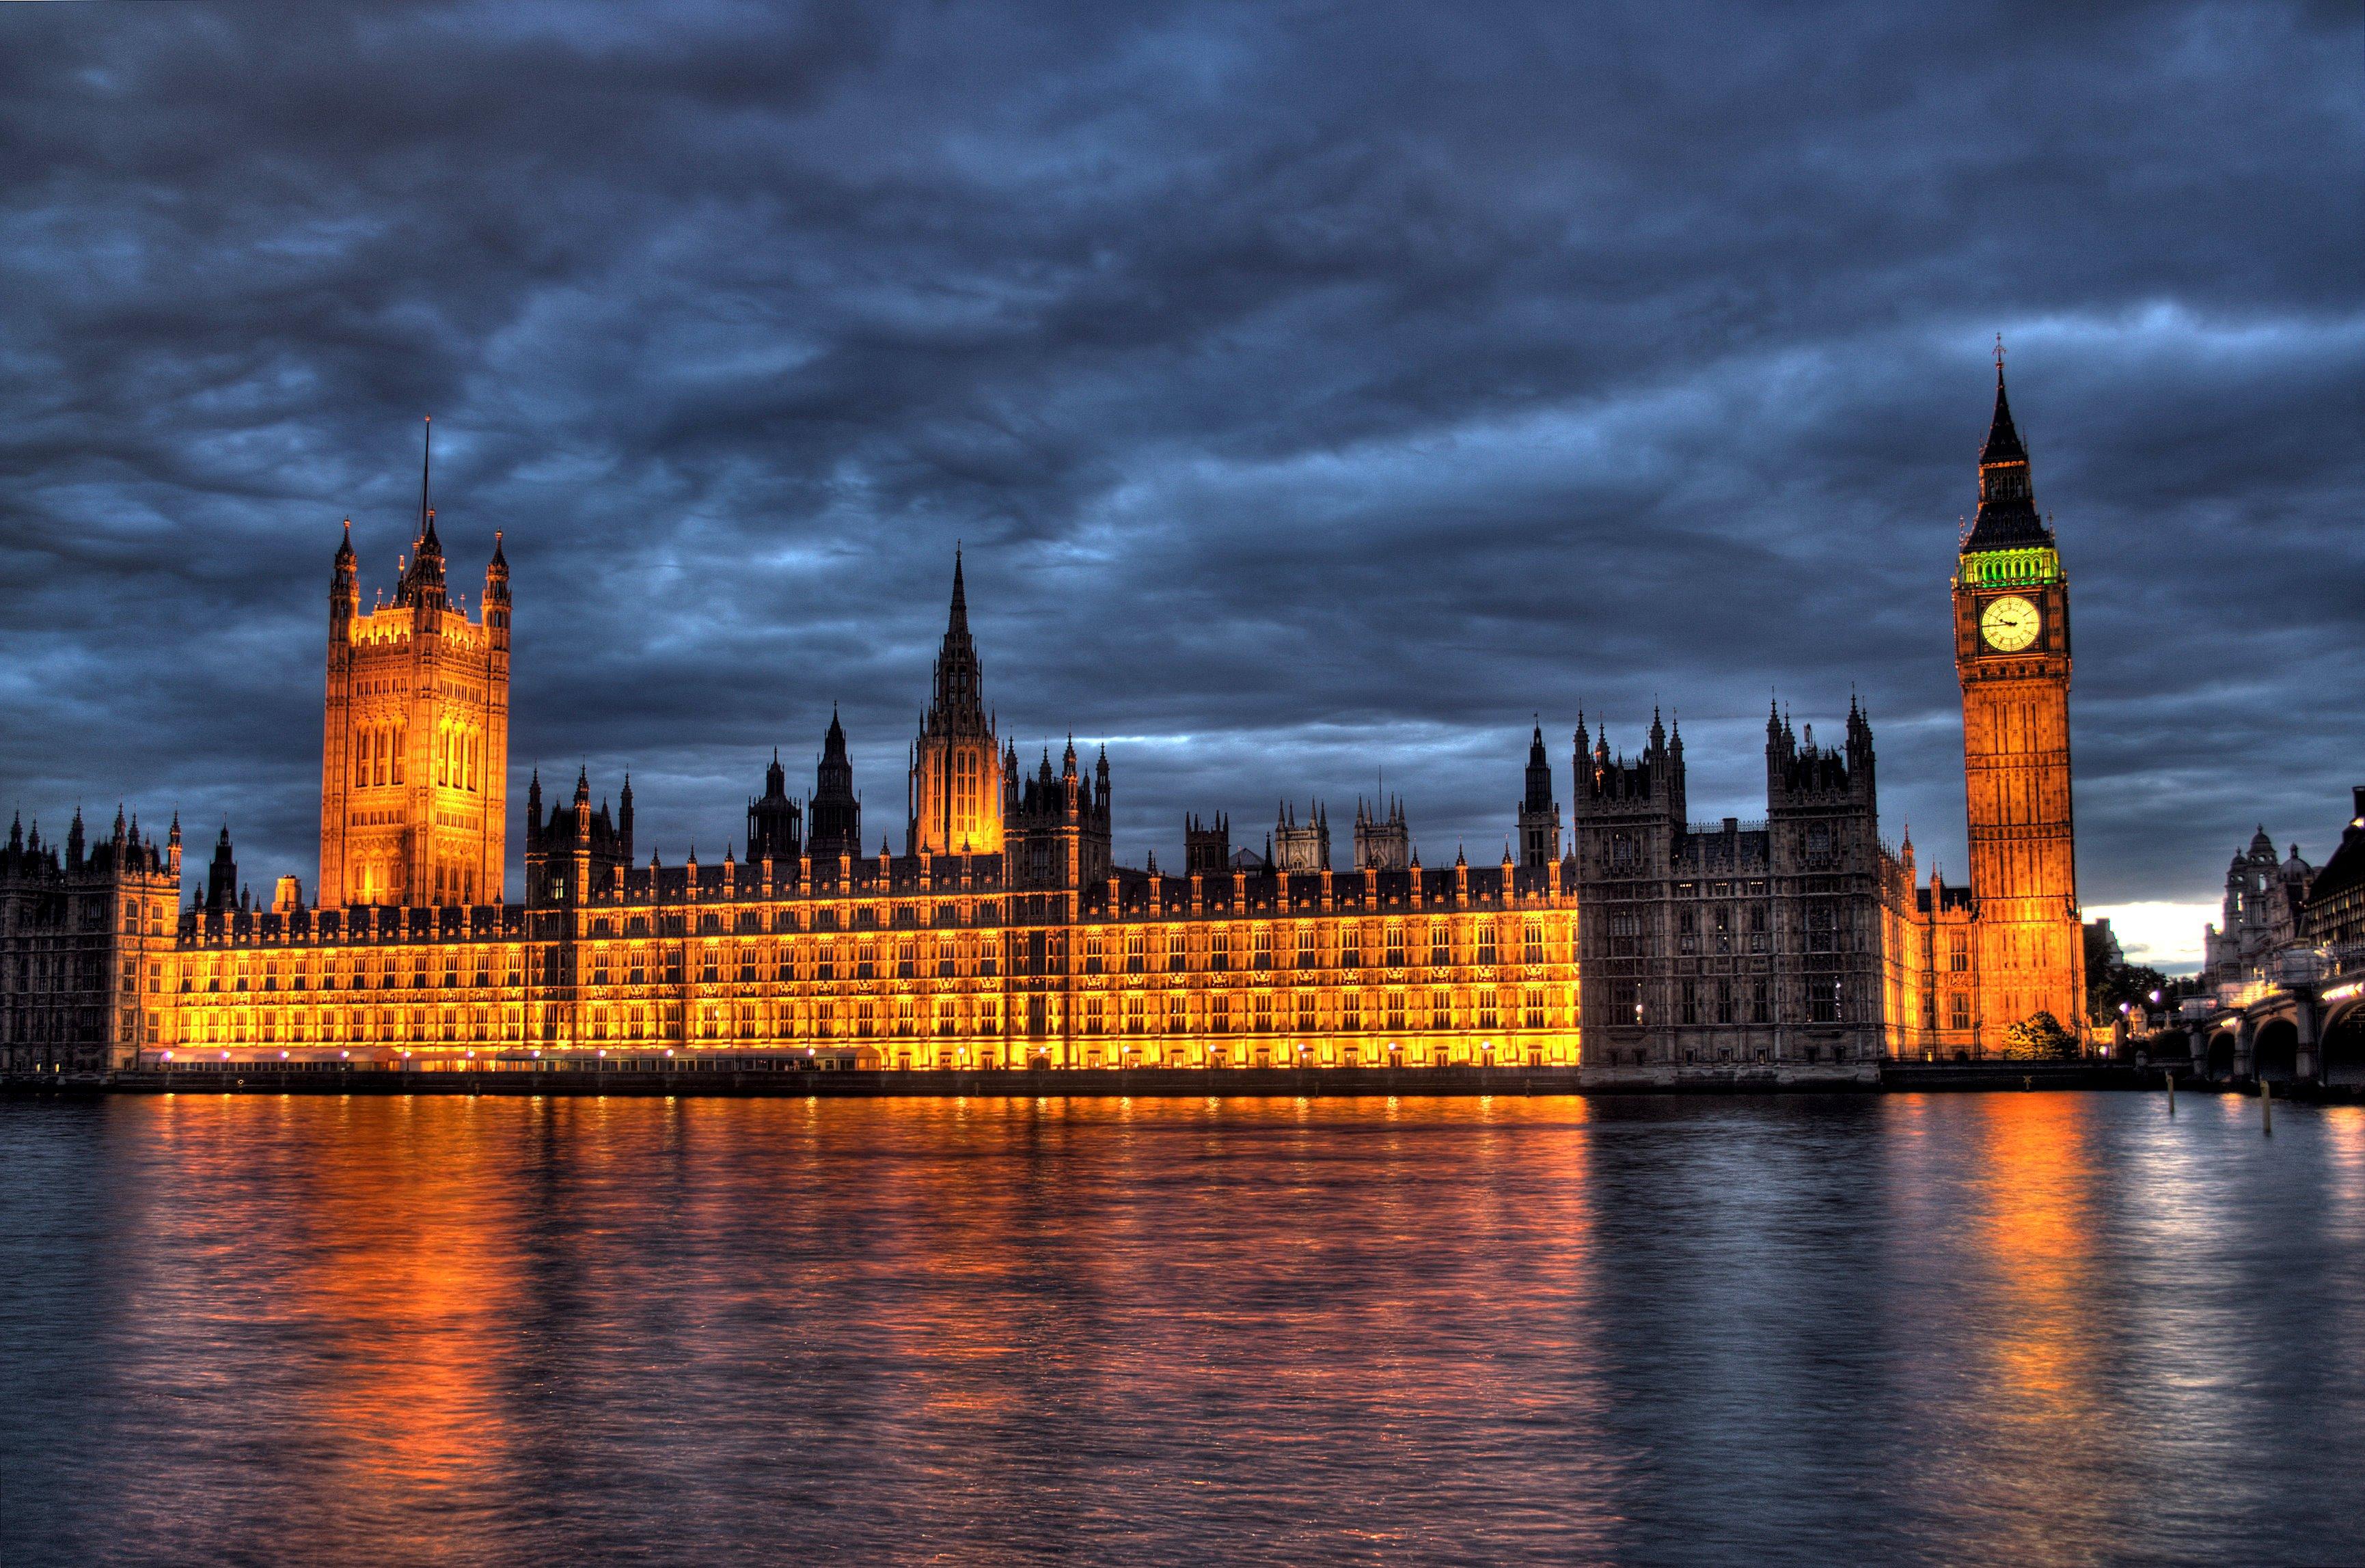 Guy fawkes british parliament